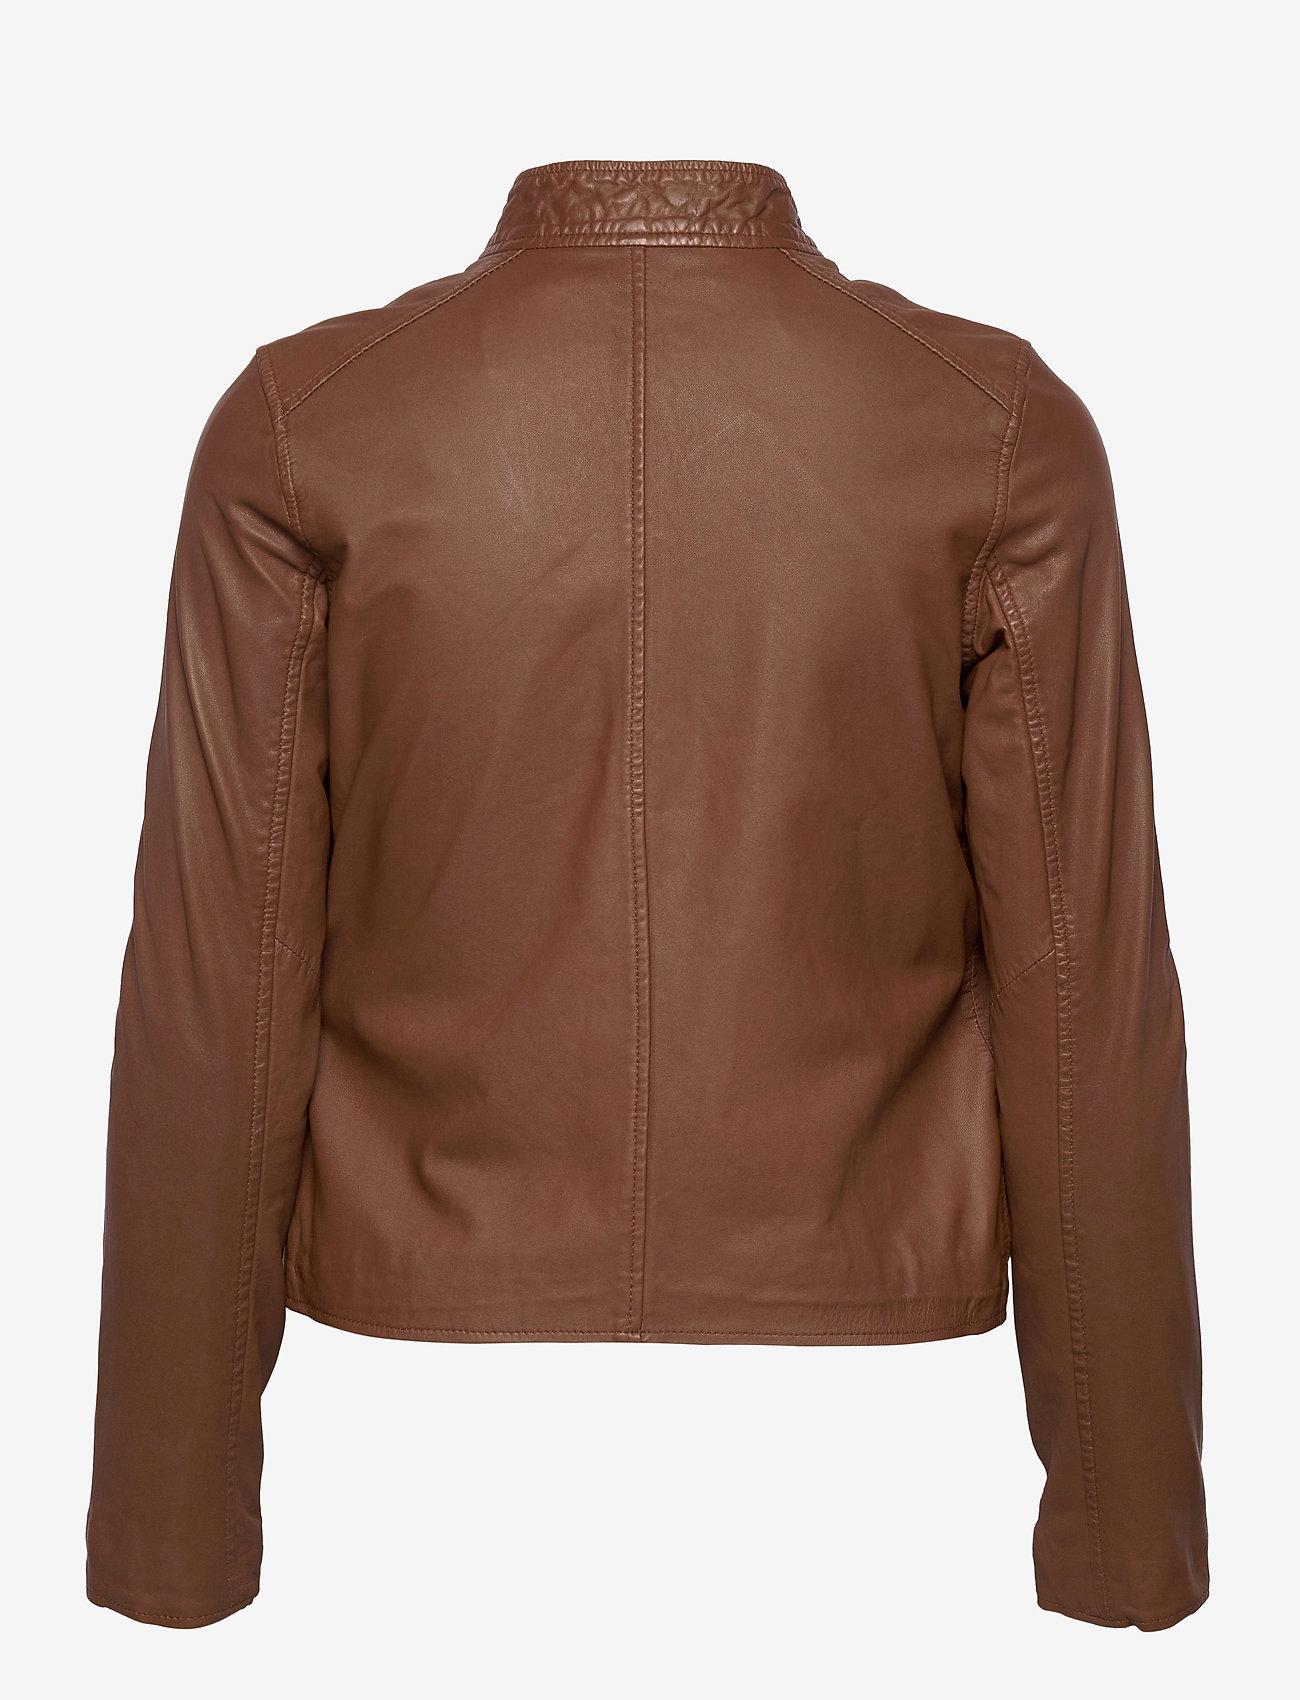 MDK / Munderingskompagniet - Carli thin leather jacket - skinnjackor - monks robe - 1